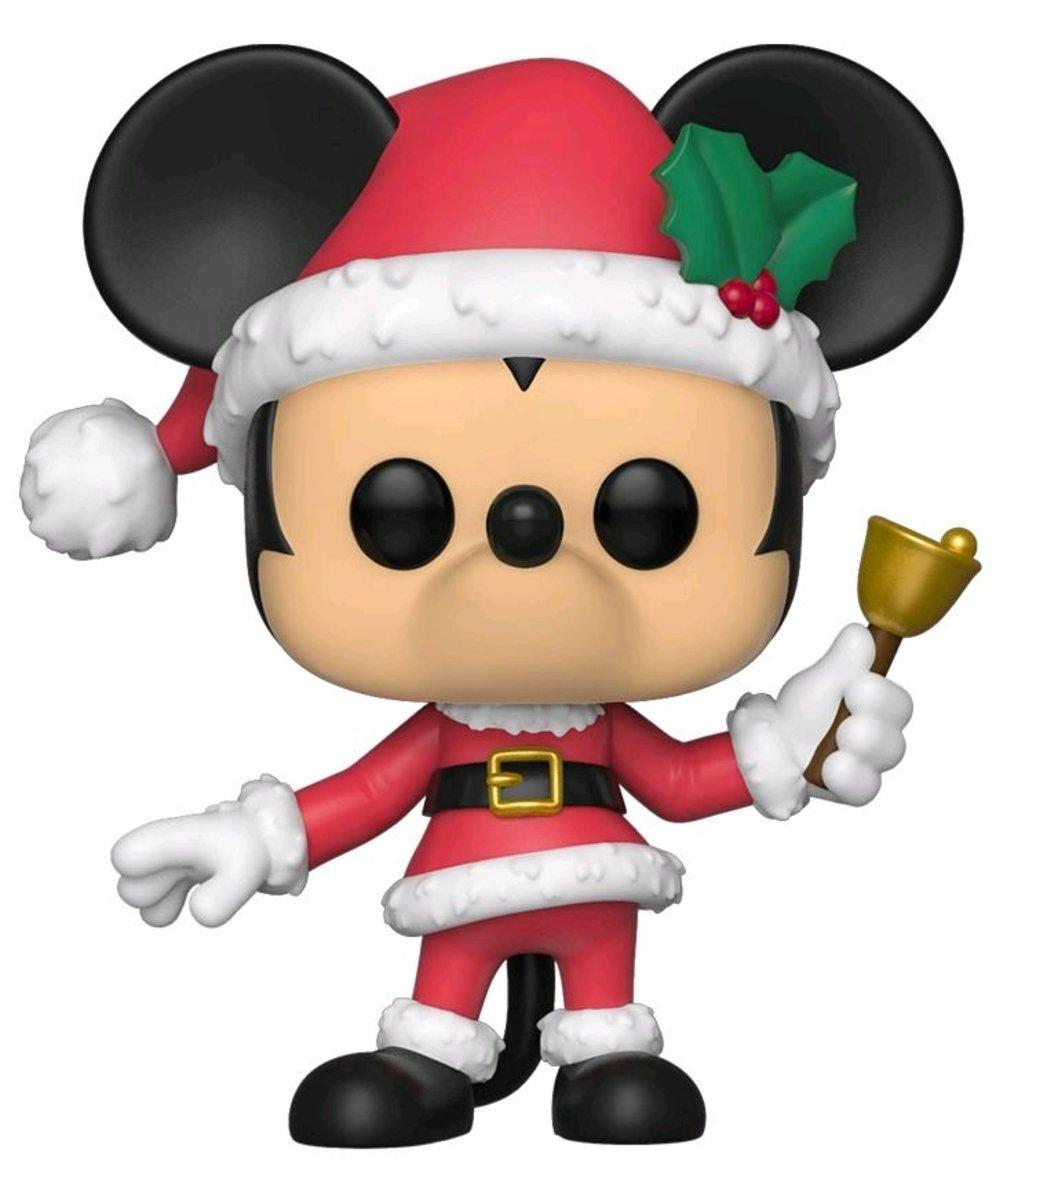 POP 迪士尼: 米奇老鼠 [迪士尼許可產品]